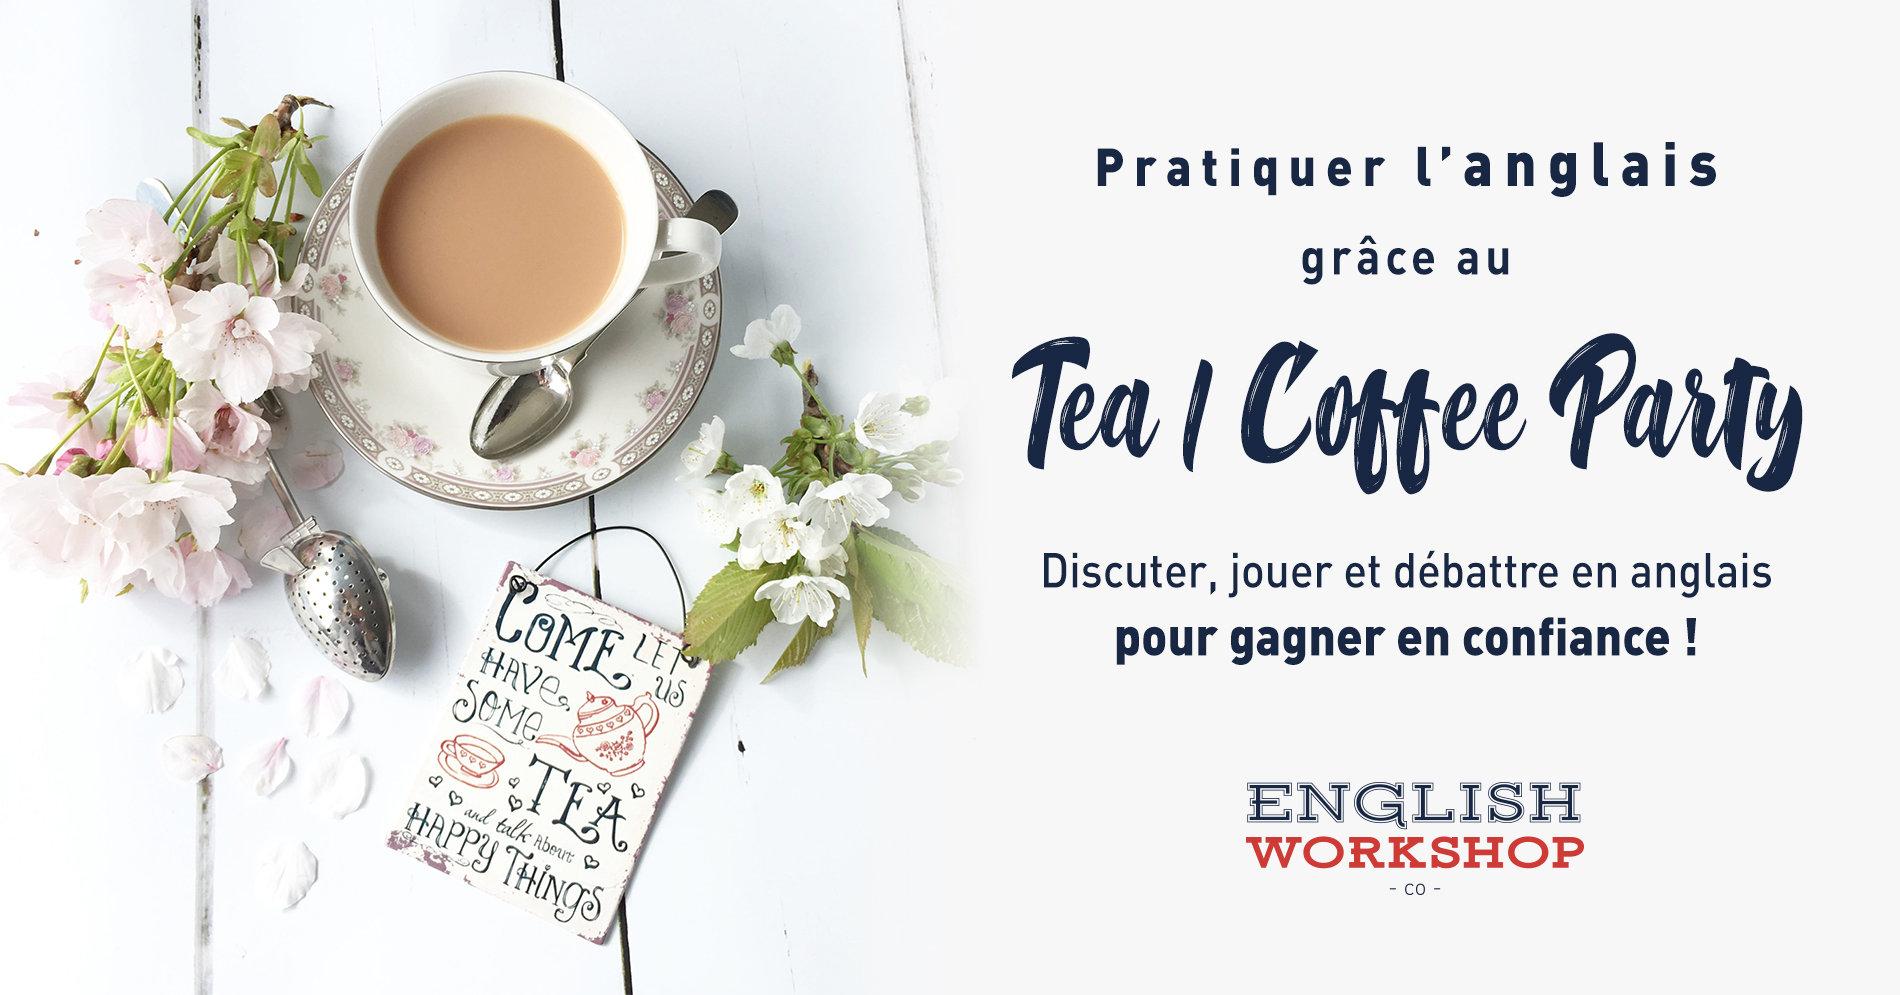 Tea/Coffee Party